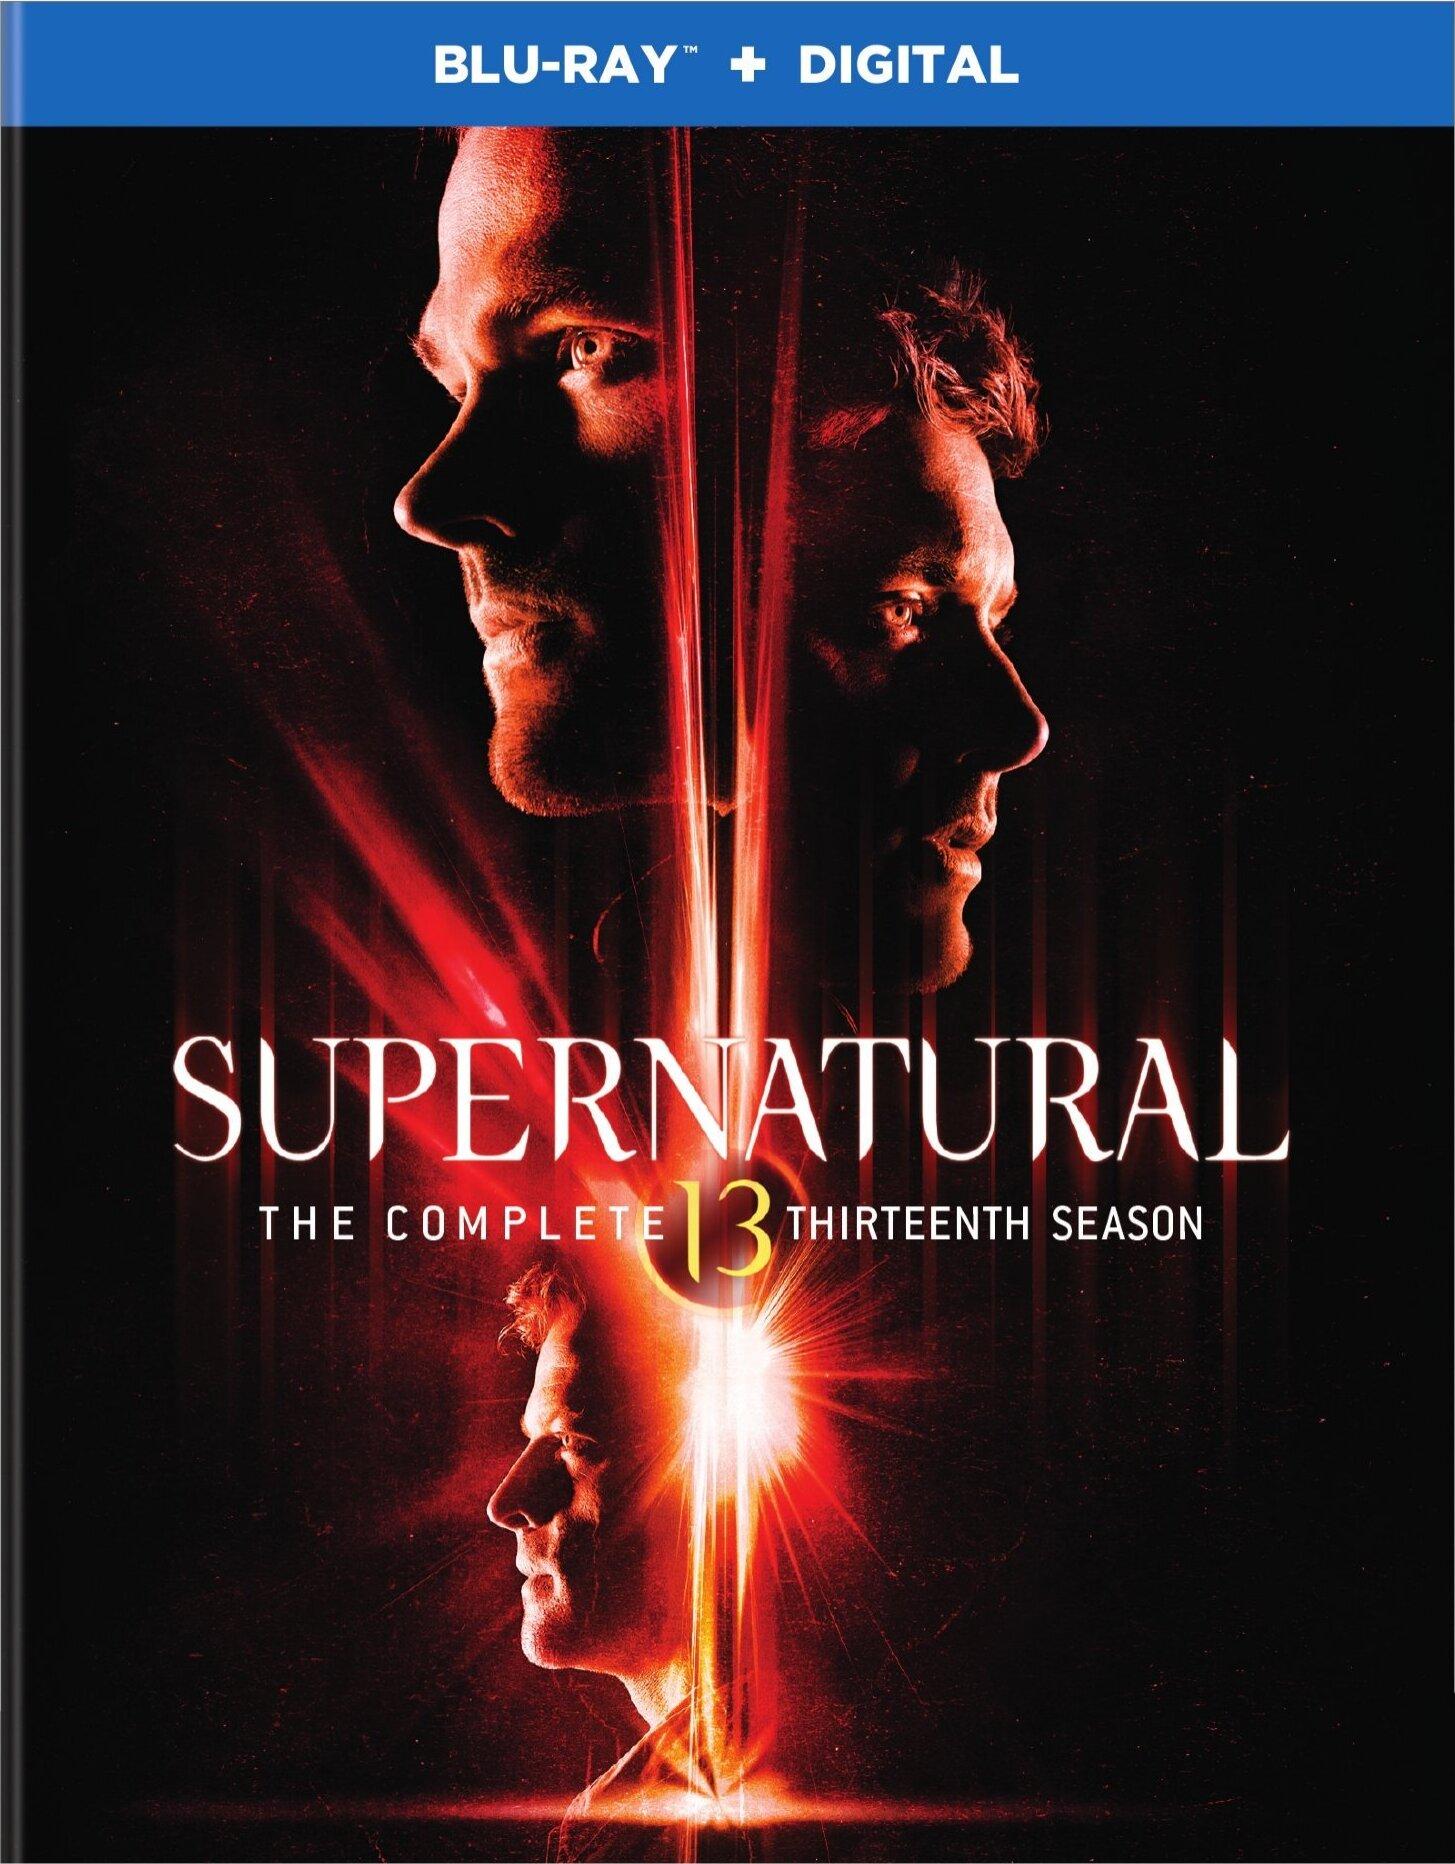 Supernatural: The Complete Thirteenth Season (TV) (2017) Blu-ray